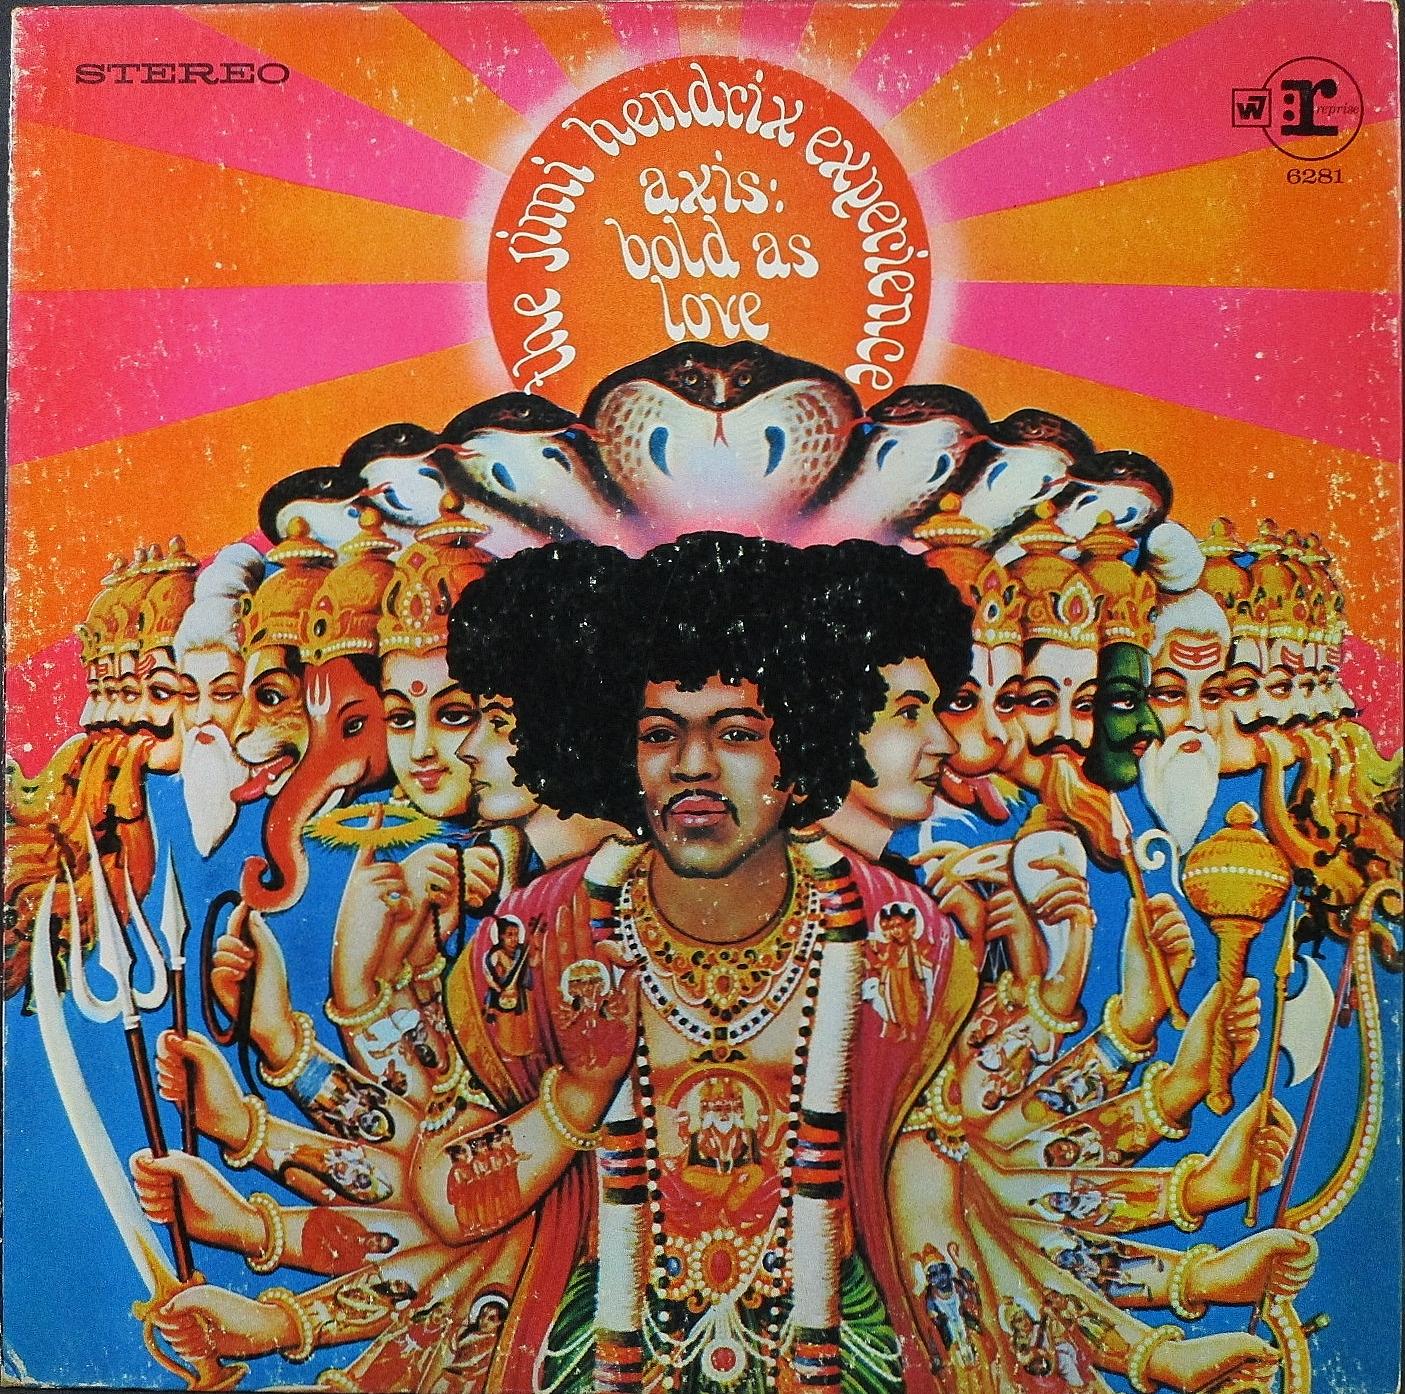 Jimi Hendrix Experience ジミ・ヘンドリックス / Axis: Bold As Love アクシス:ボールド・アズ・ラヴ